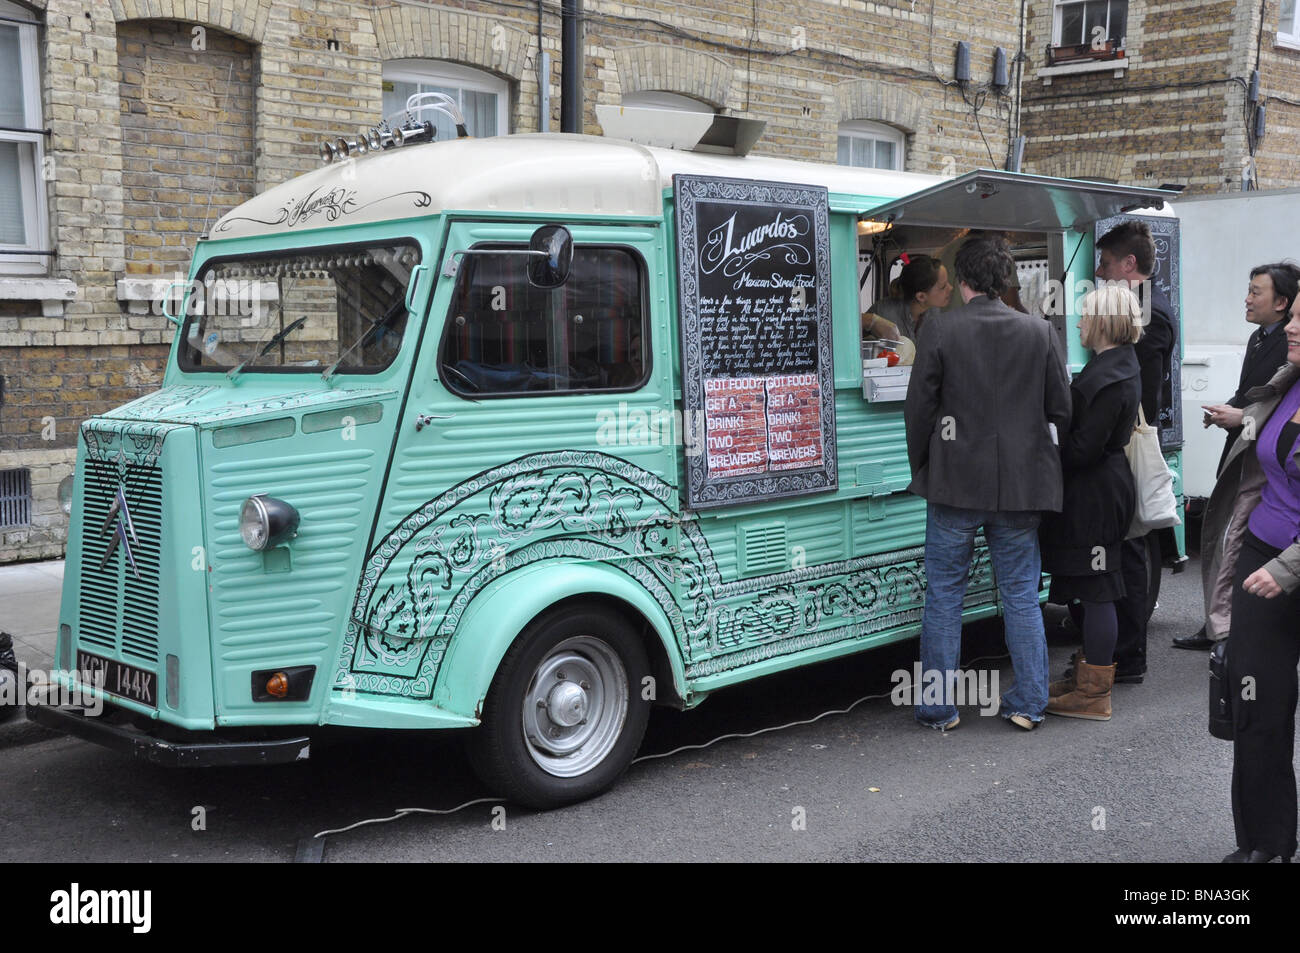 Mexican Street Food Catering Van London England UK - Stock Image